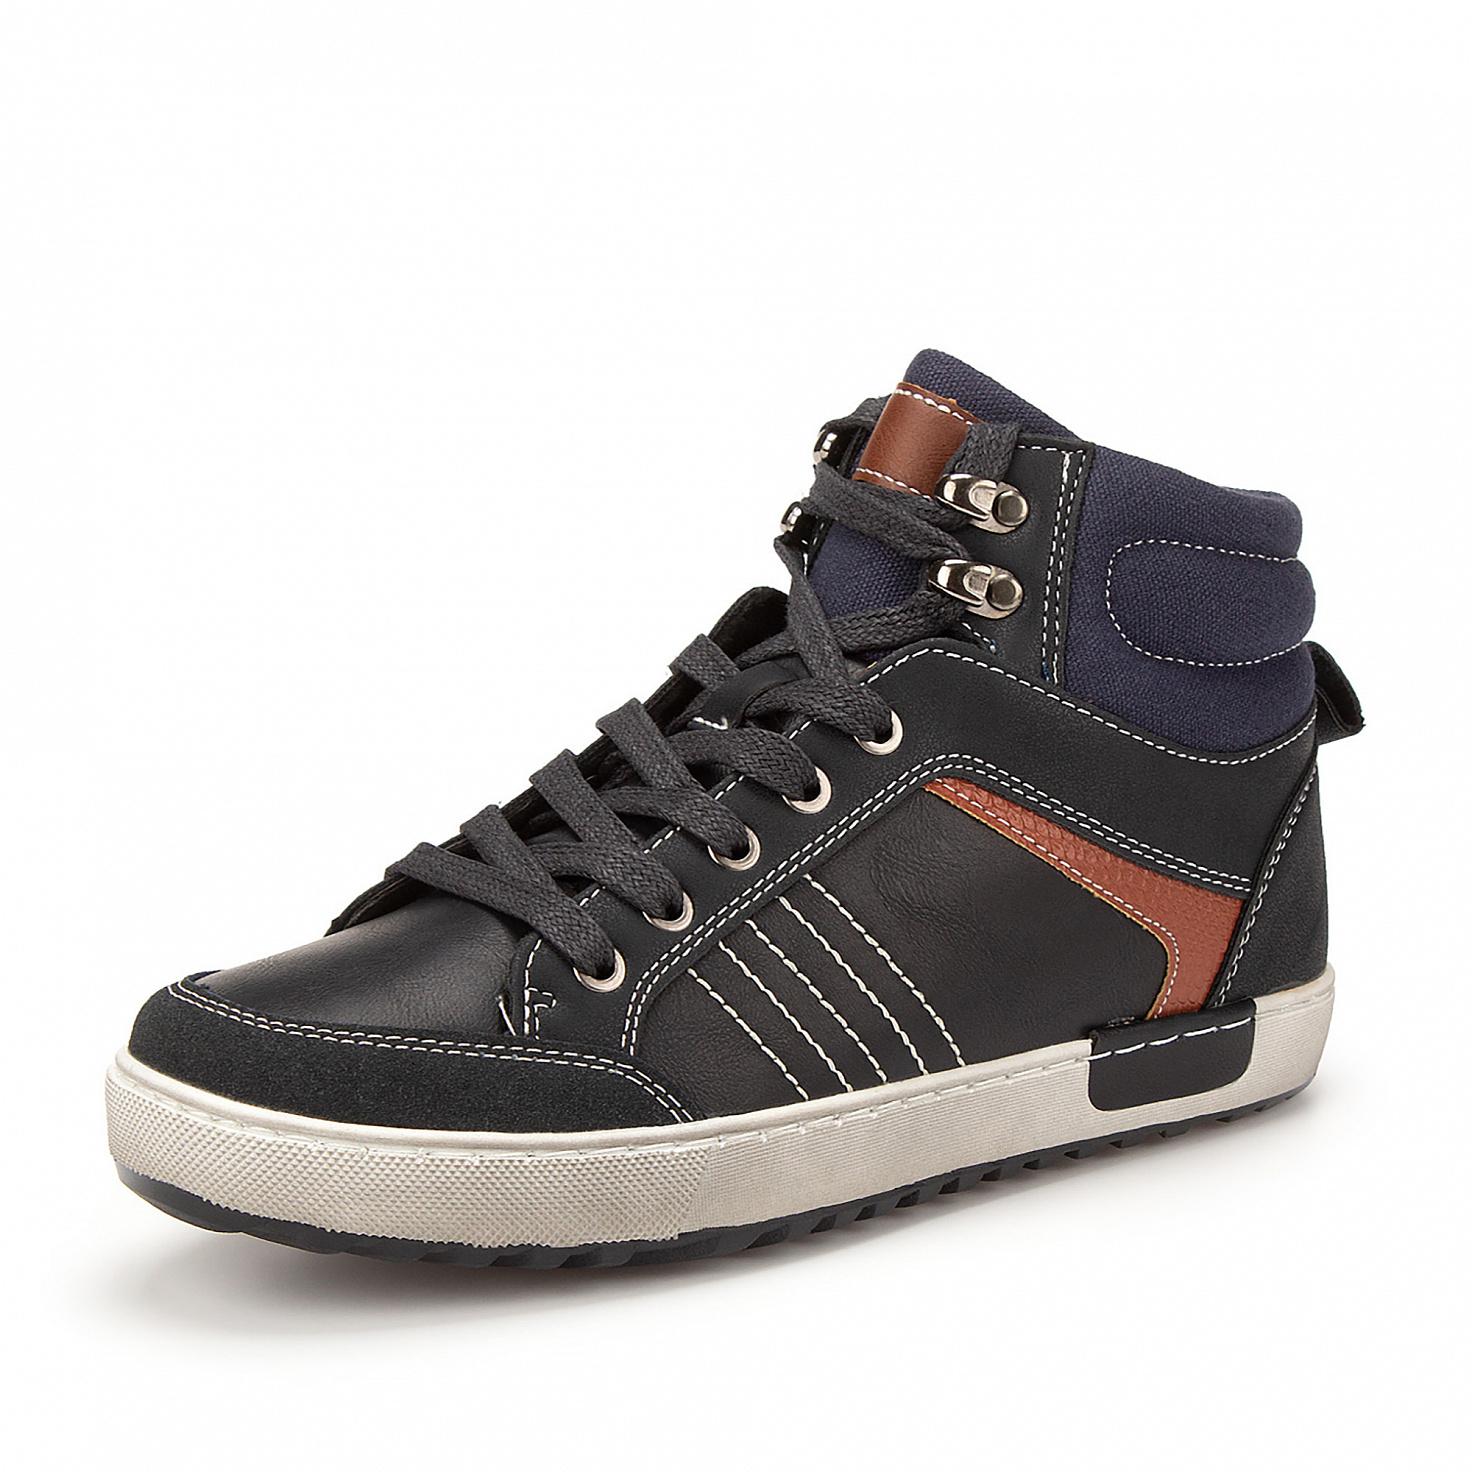 Купить 189-02BO-032SR, Ботинки для мальчиков ZENDEN, цв. синий, р-р 37,